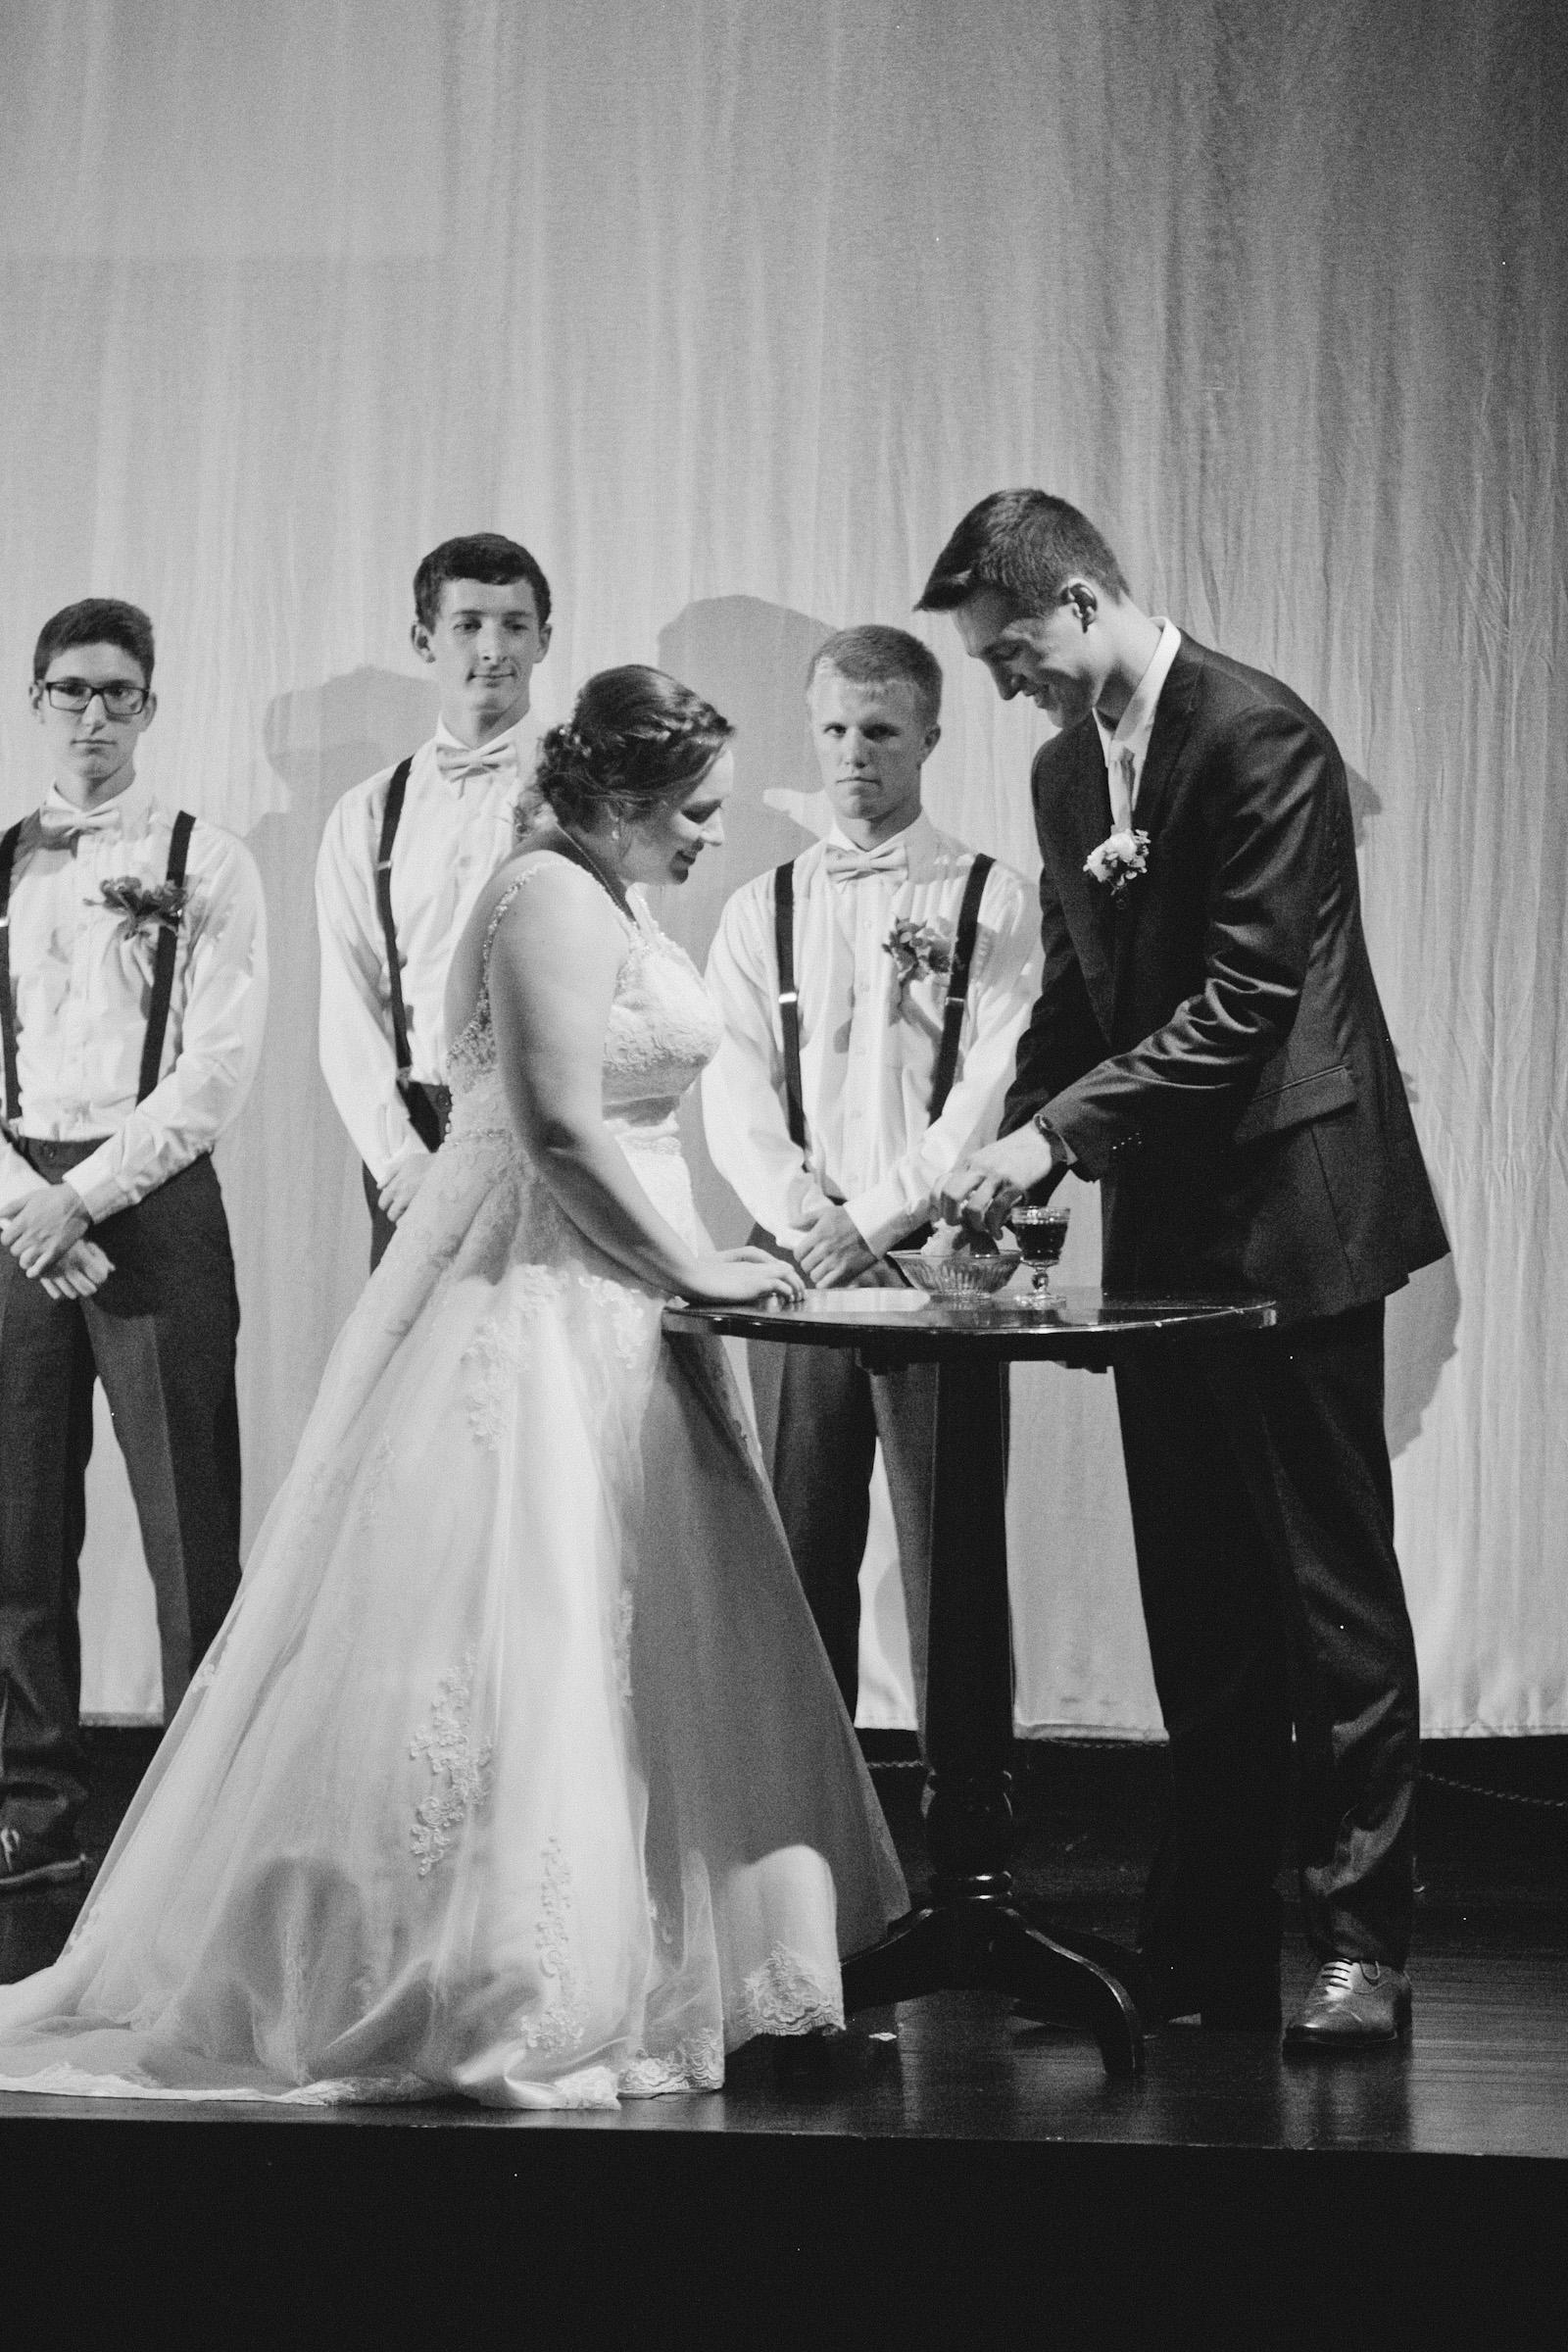 taking-communion-at-wedding